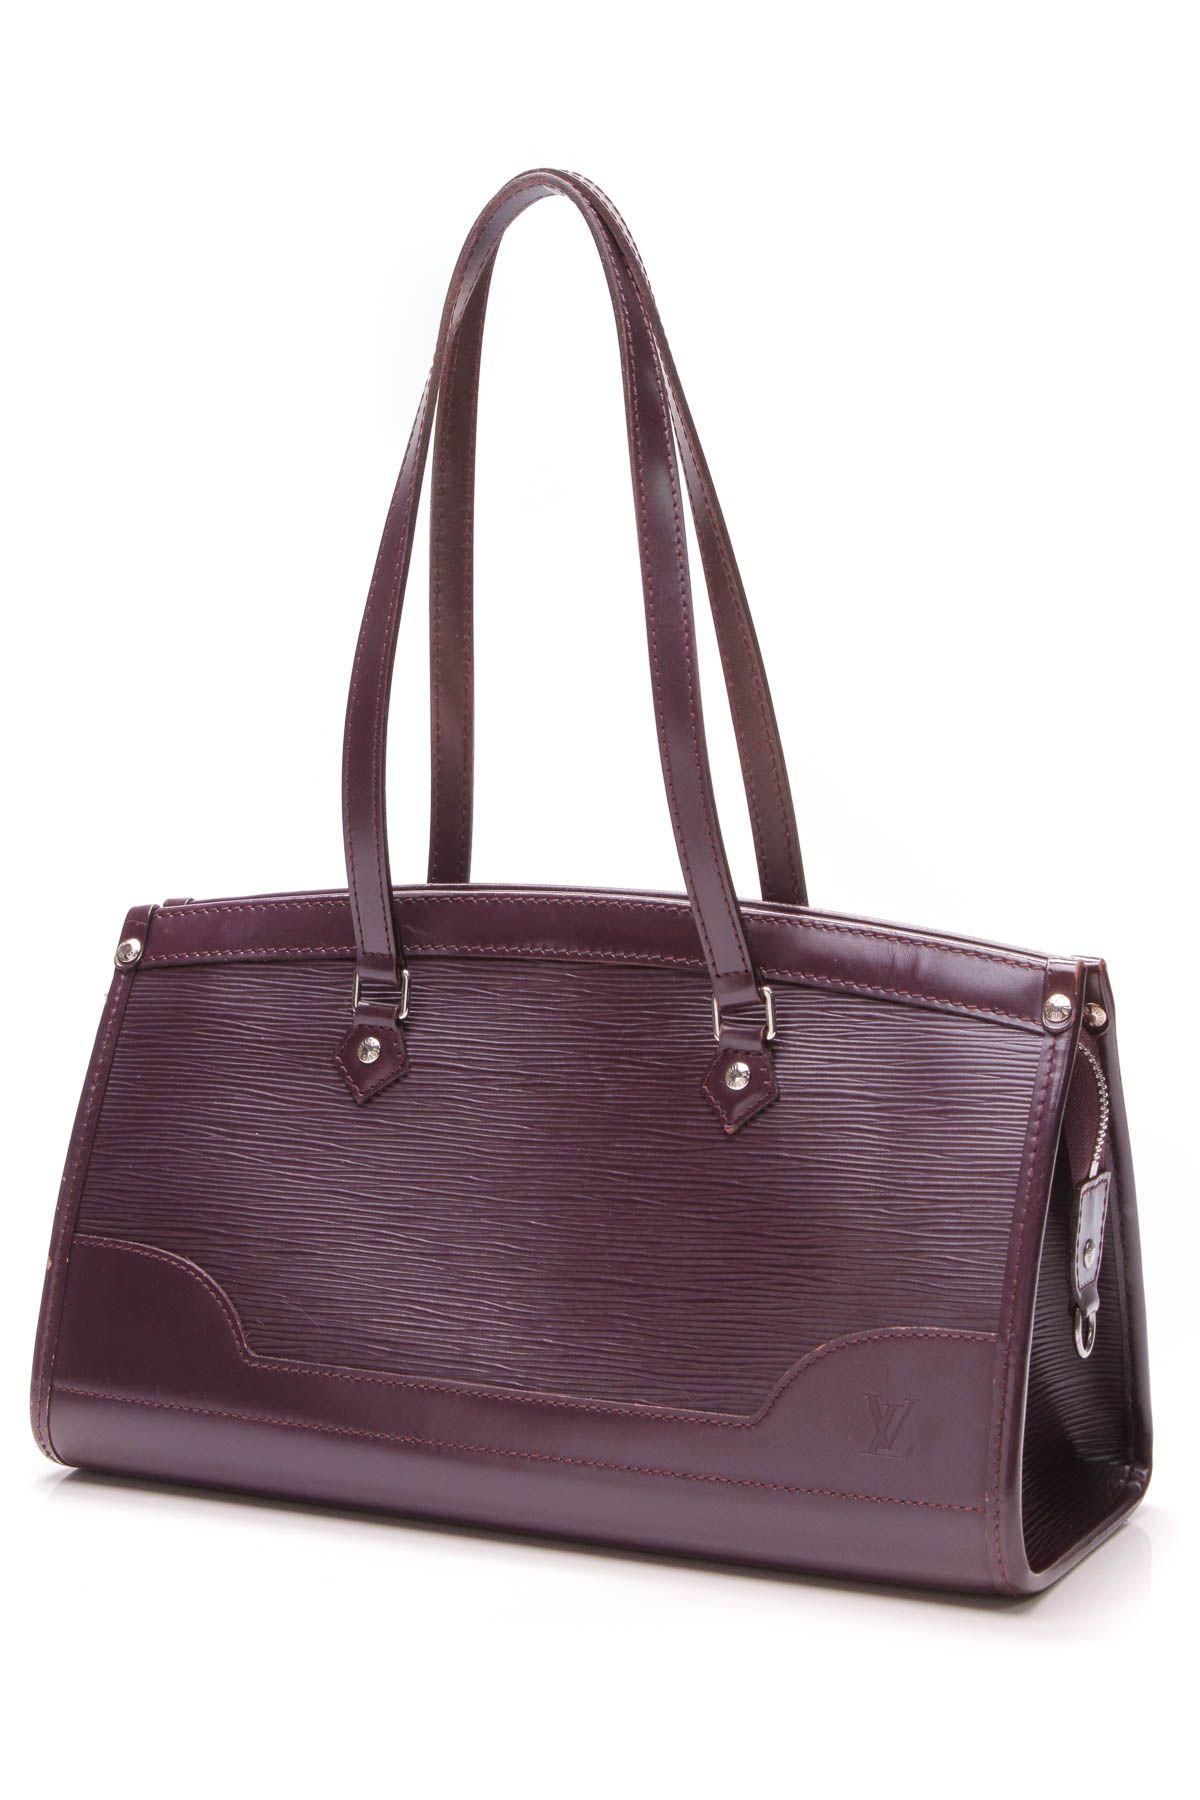 69c4dfb79661 Louis Vuitton Madeleine PM BAg - Purple